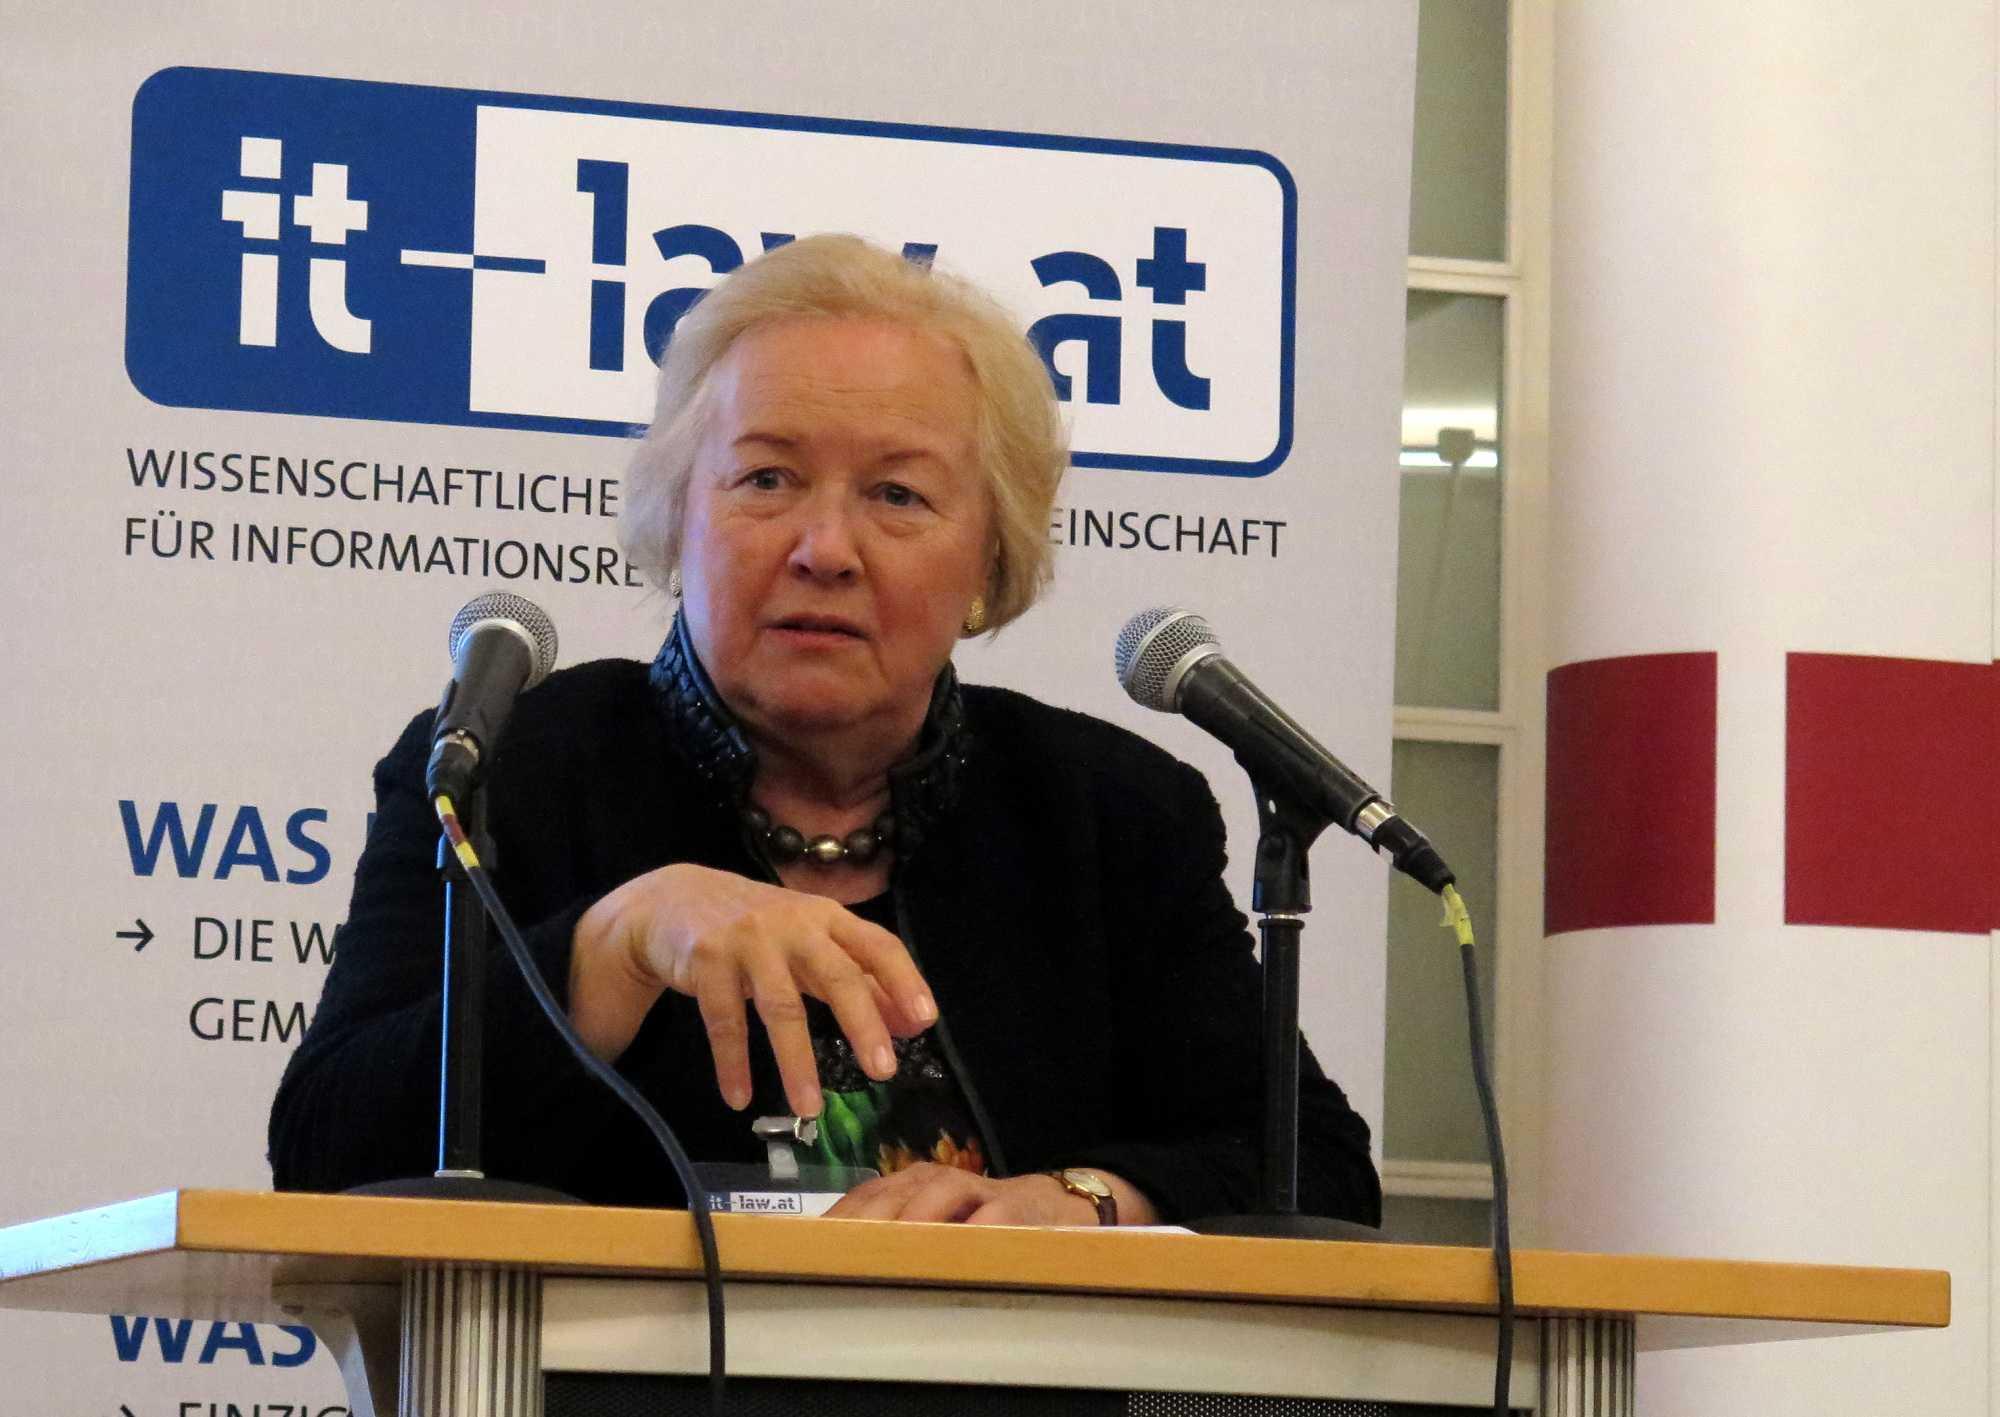 Waltraut Kotschy